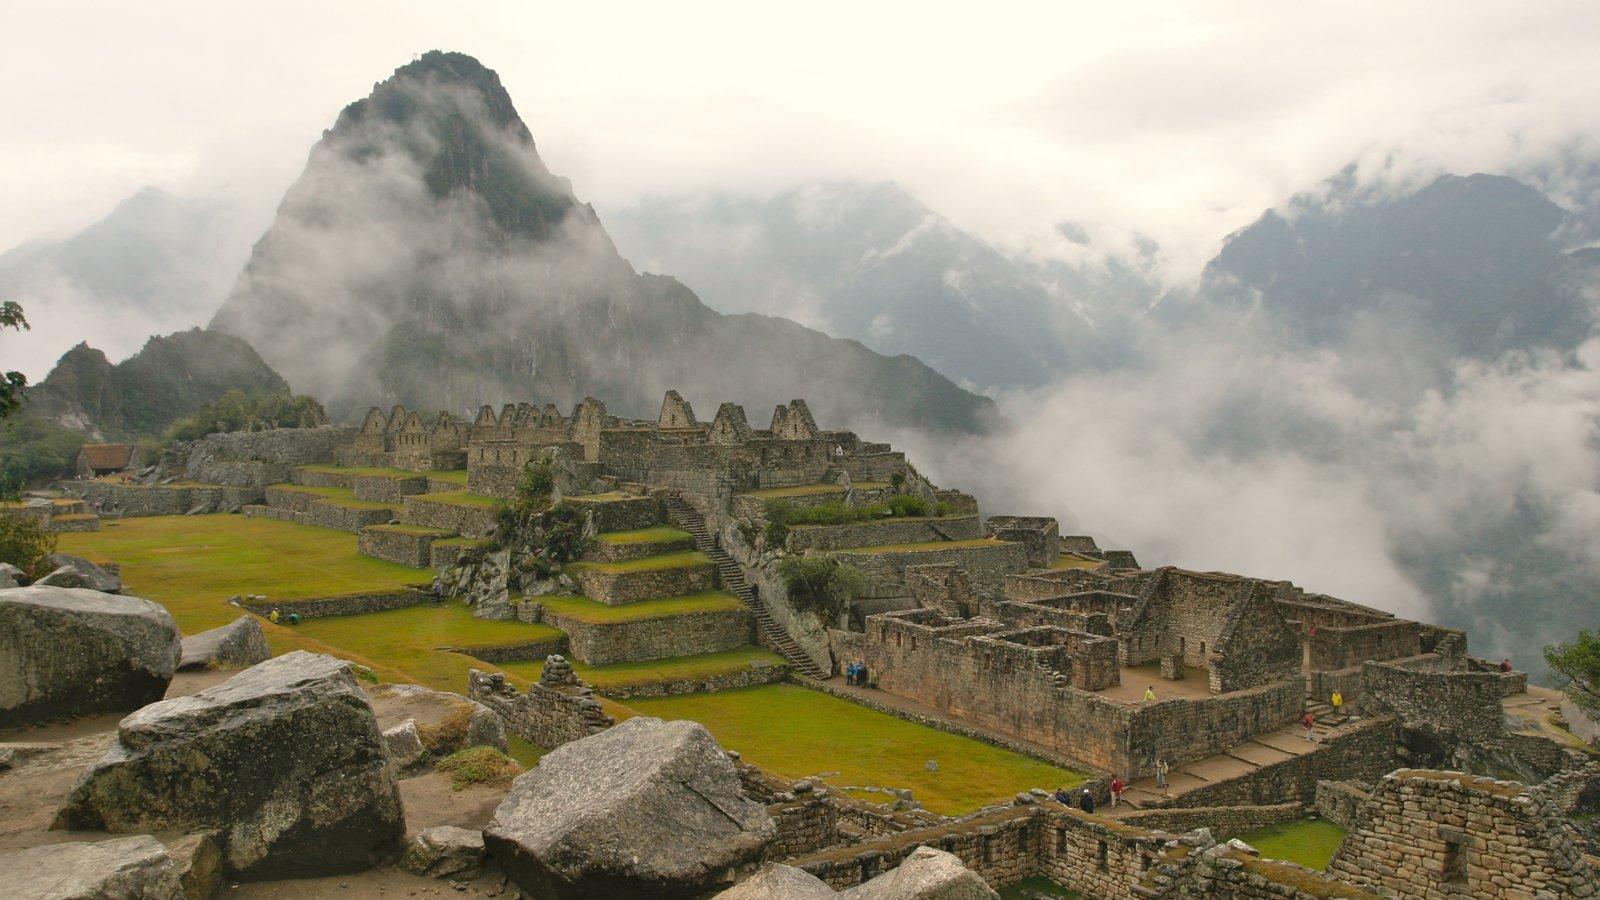 Machu Picchu caracterizando montanhas, ruínas de edifício e neblina